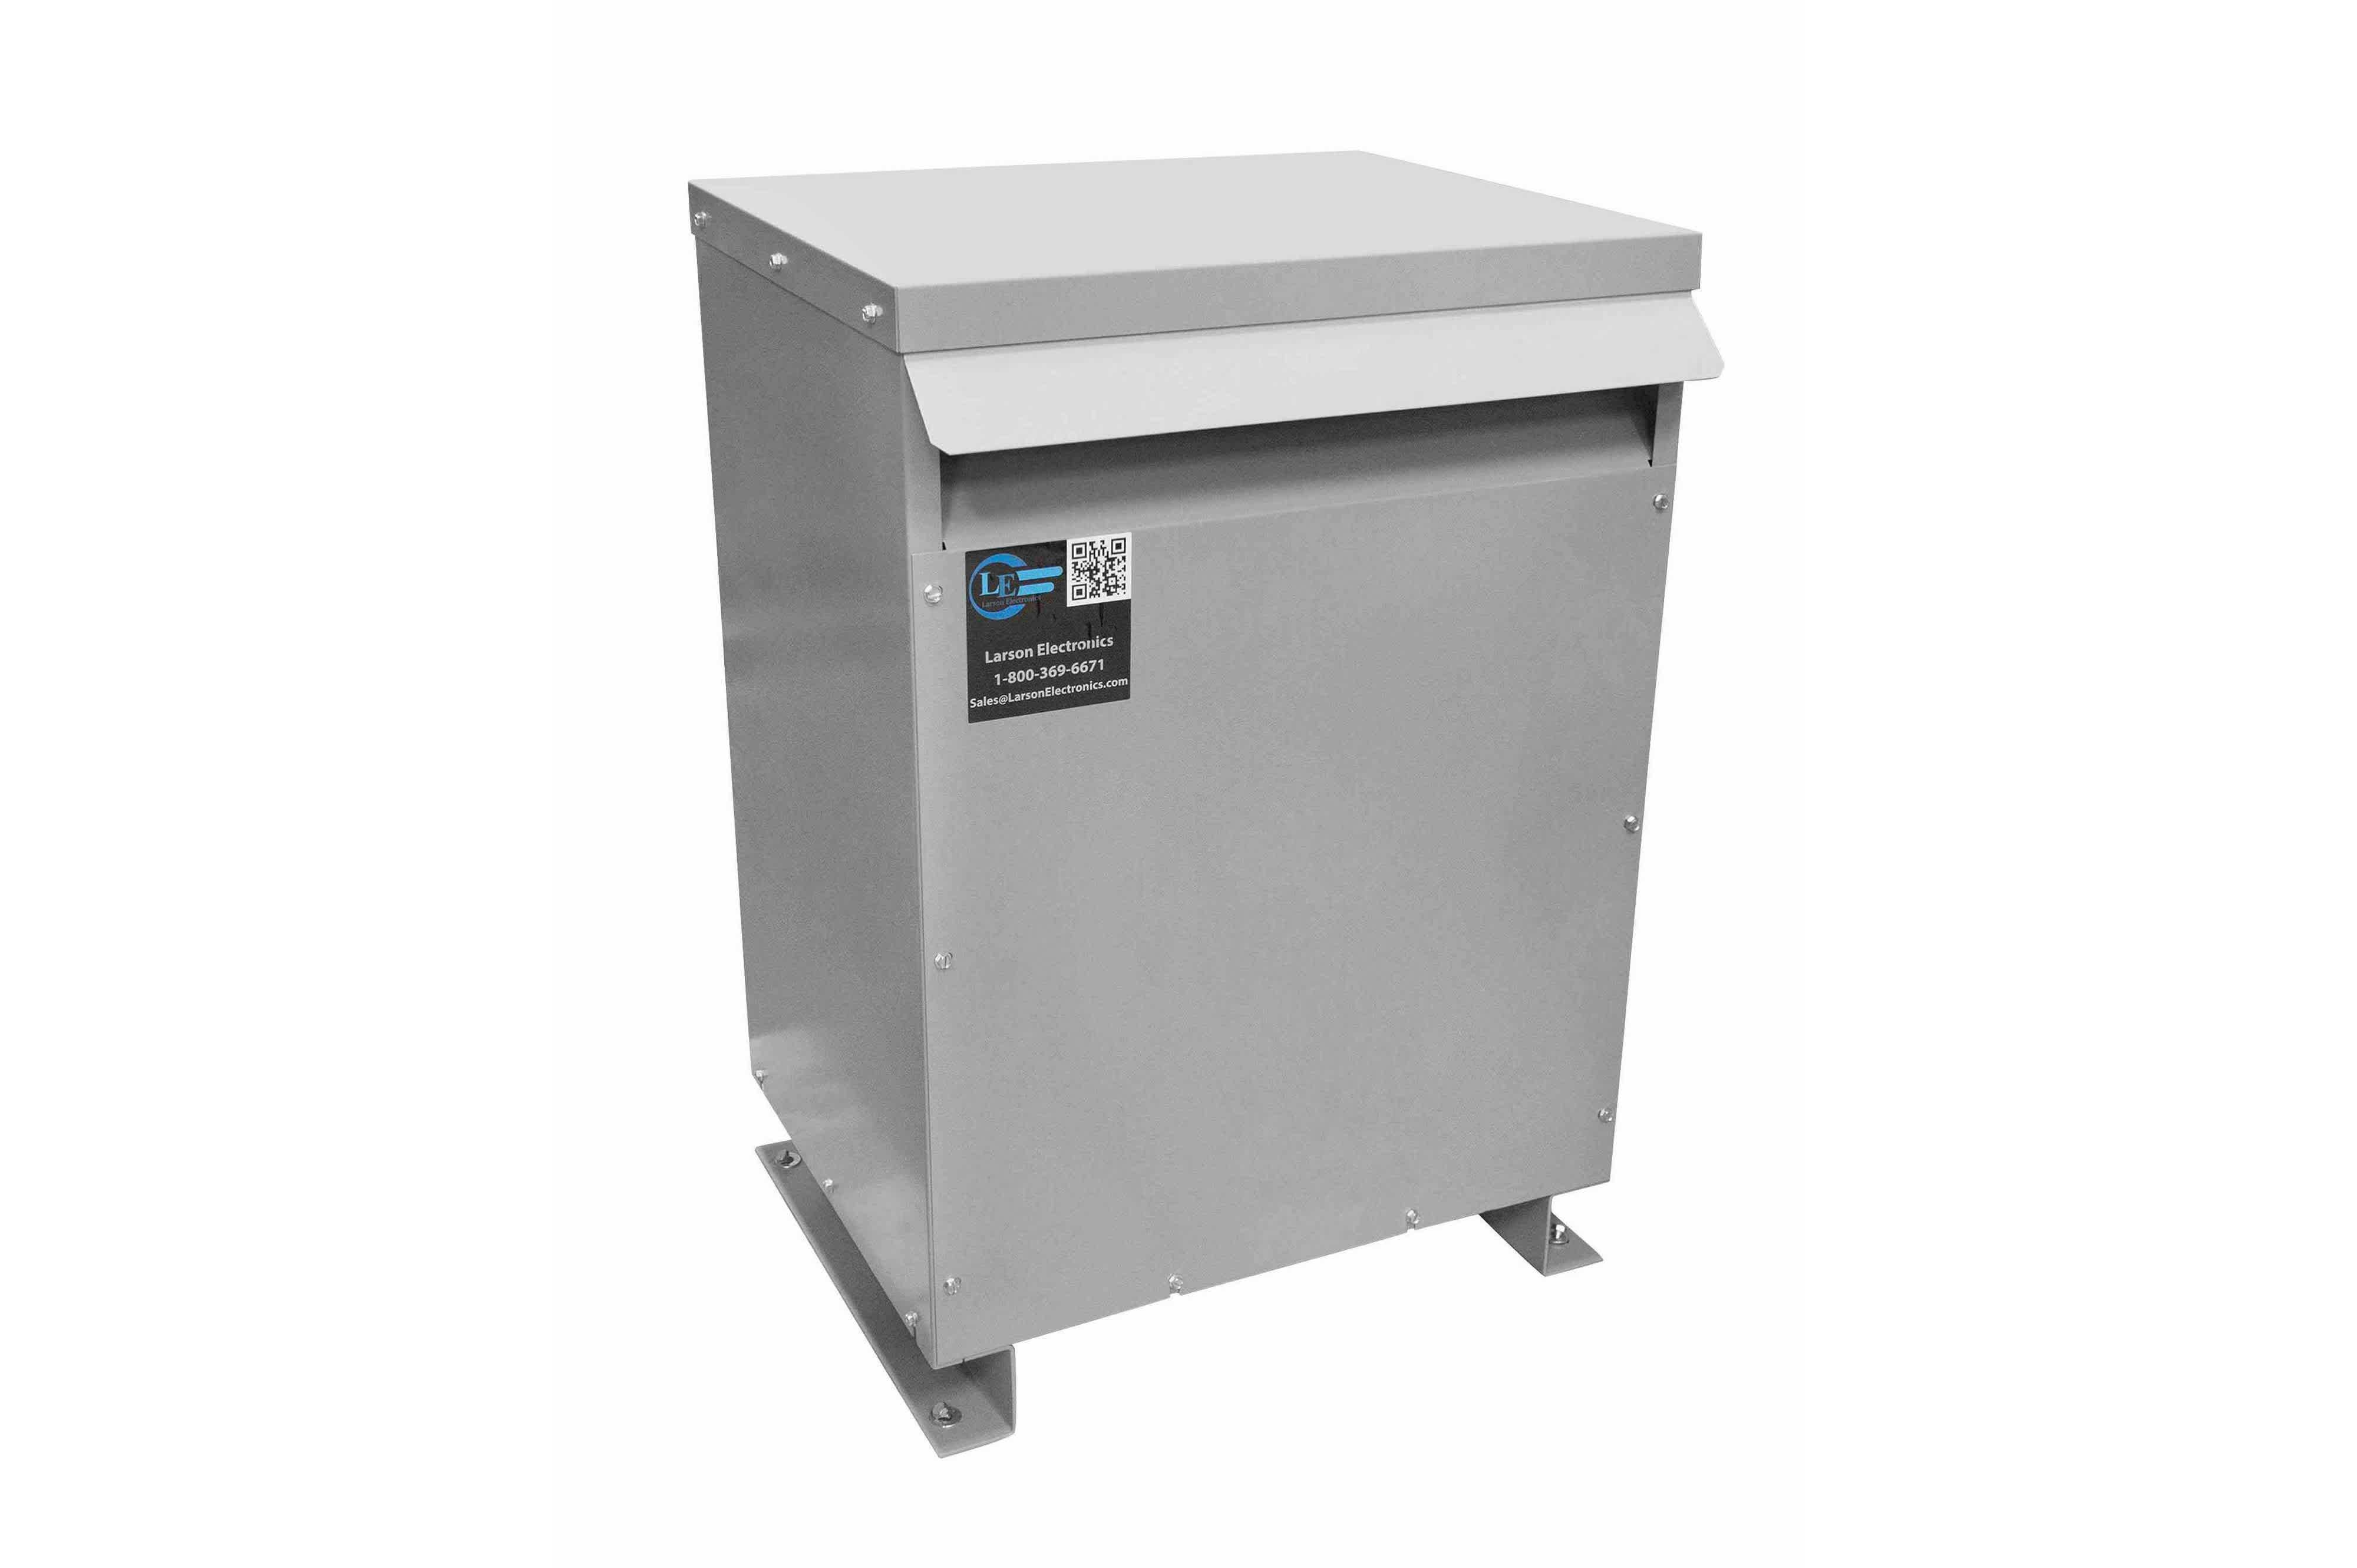 137.5 kVA 3PH Isolation Transformer, 600V Wye Primary, 480V Delta Secondary, N3R, Ventilated, 60 Hz